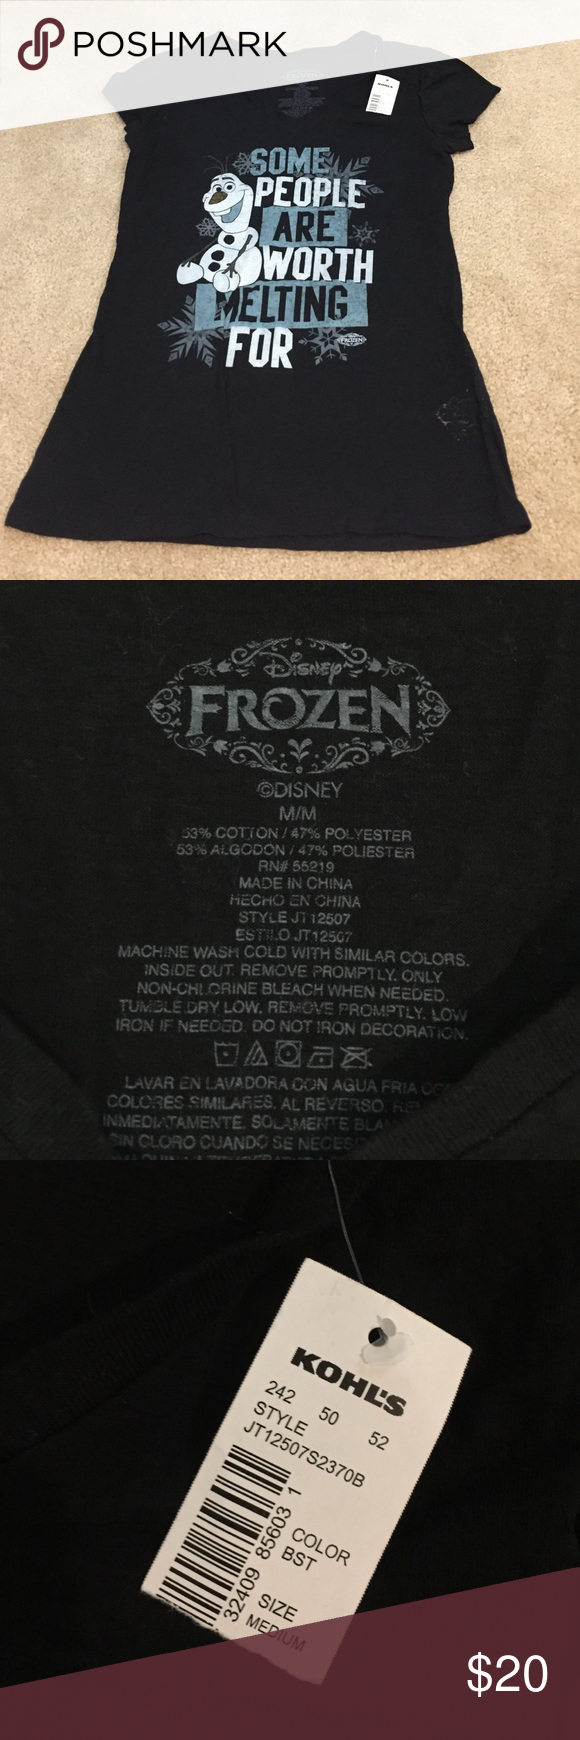 Black t shirts kohls - Frozen T Shirt Brand New Disney Kohl S Frozen T Shirt With Olaf Disney